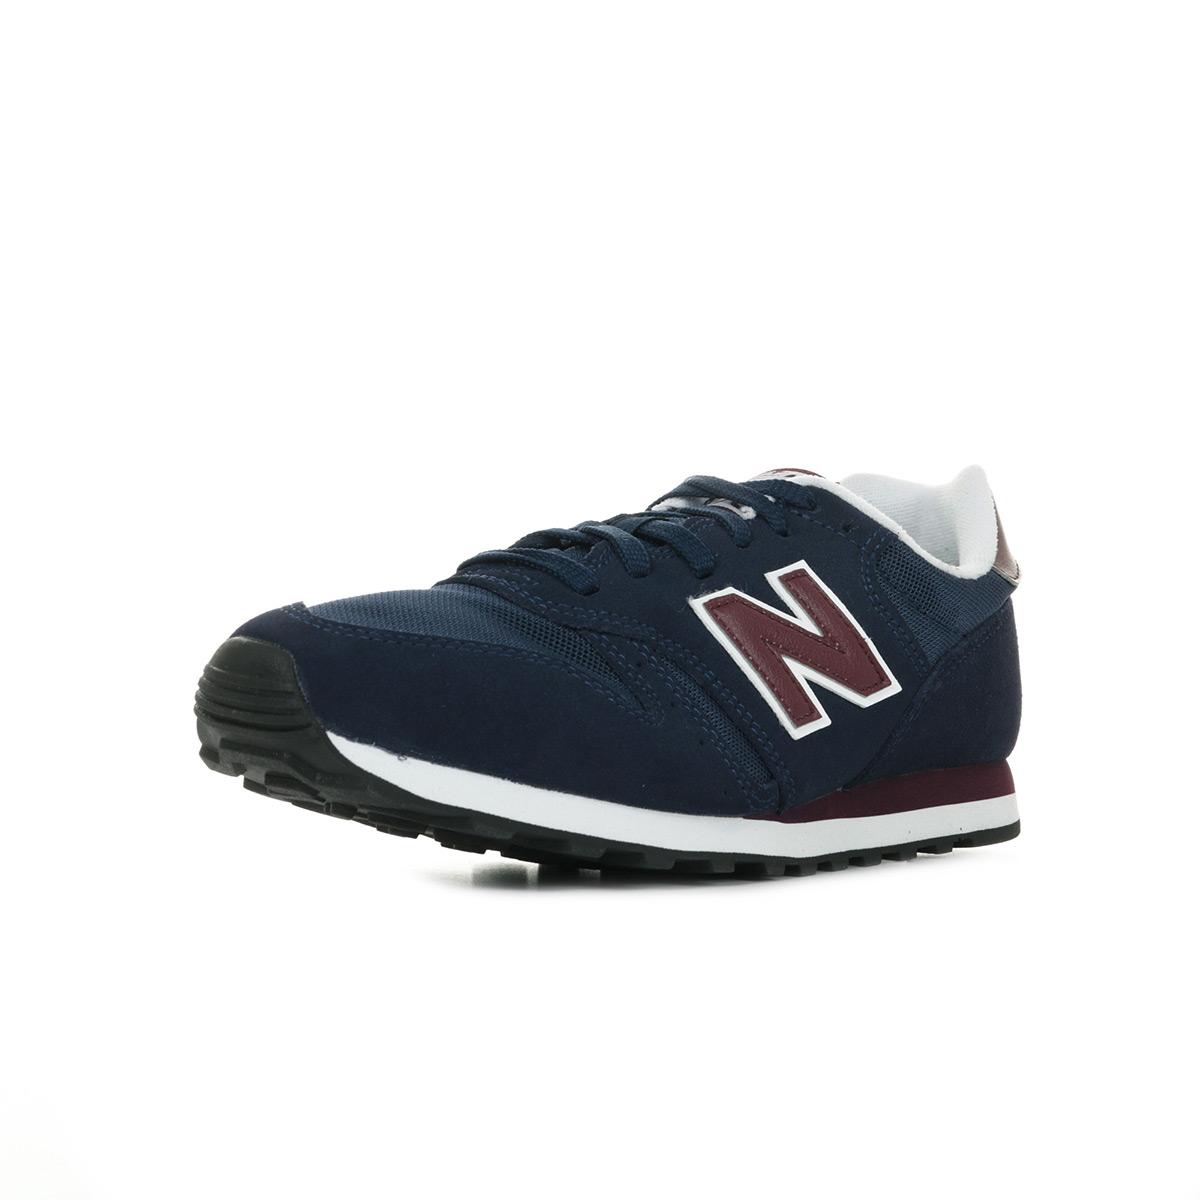 new balance 373 homme navy